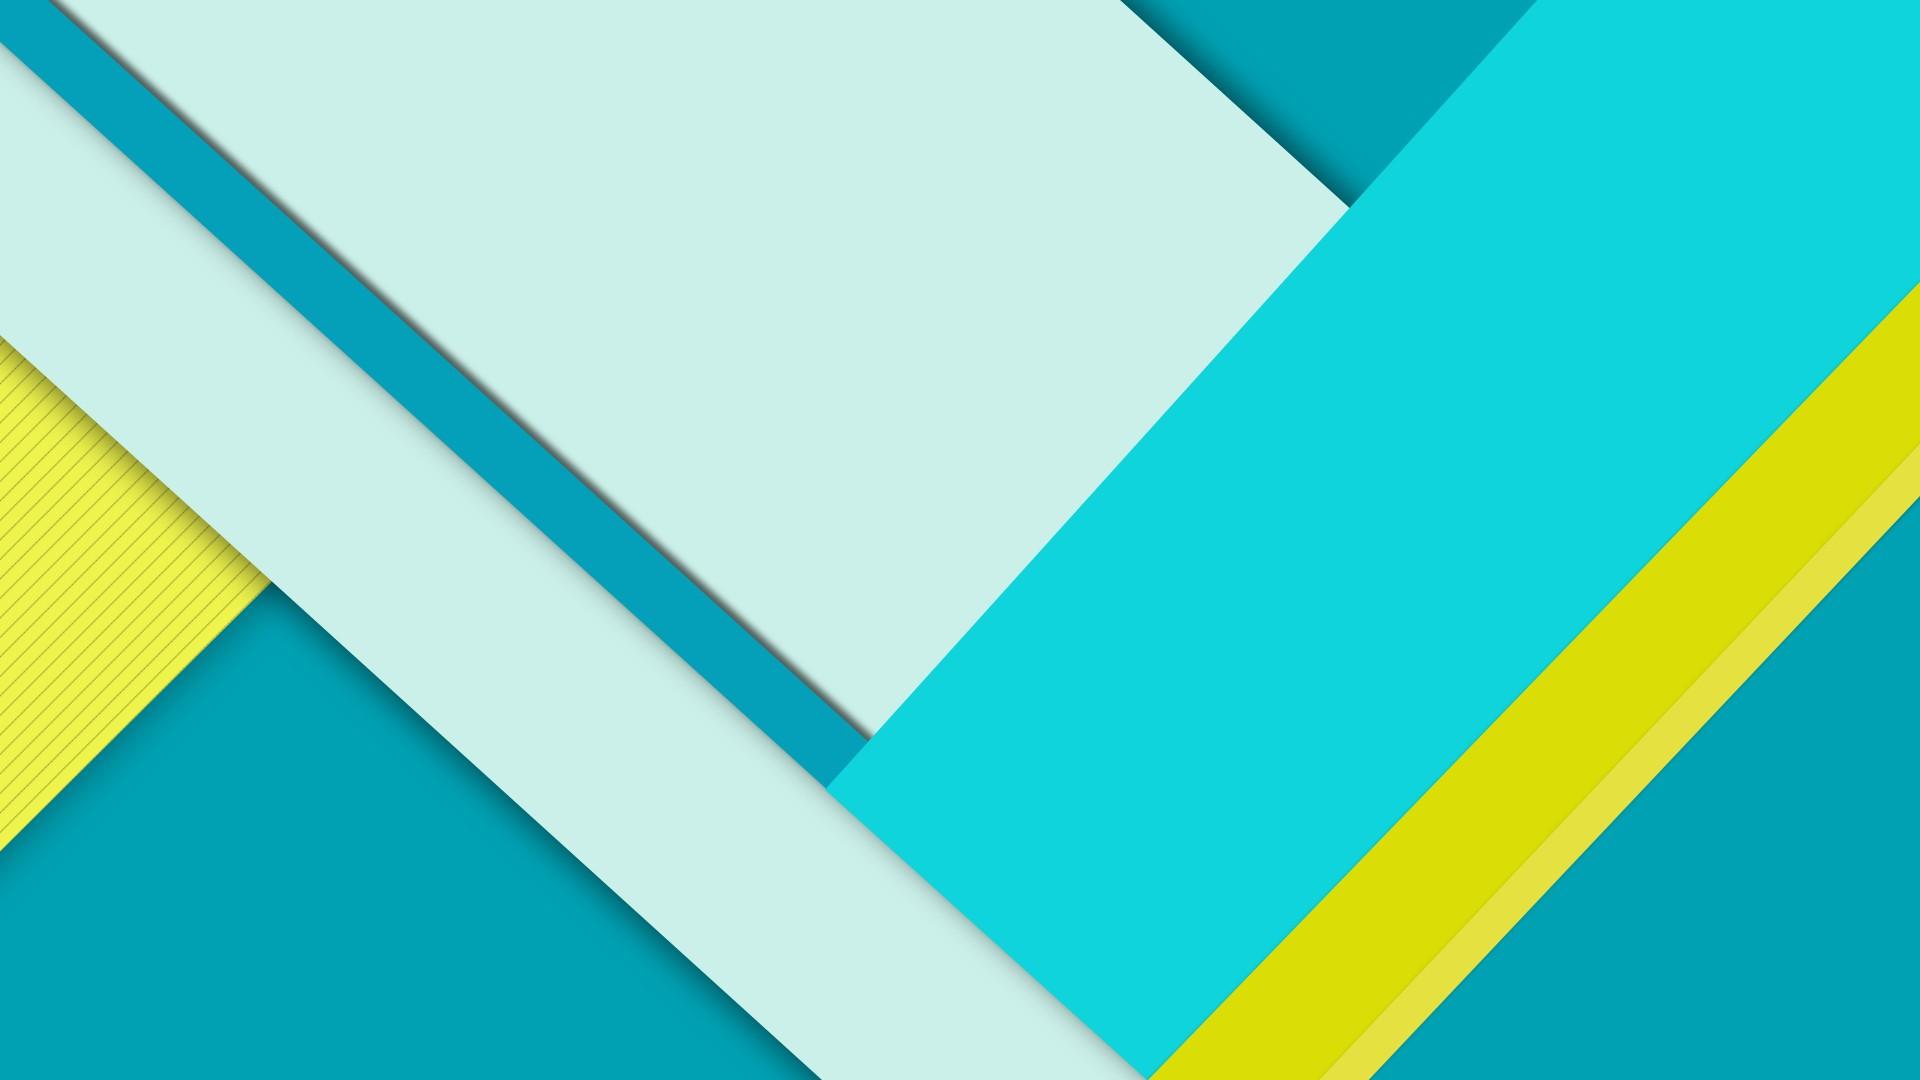 Material Design Wallpaper Blue 031 - www.opendesktop.org